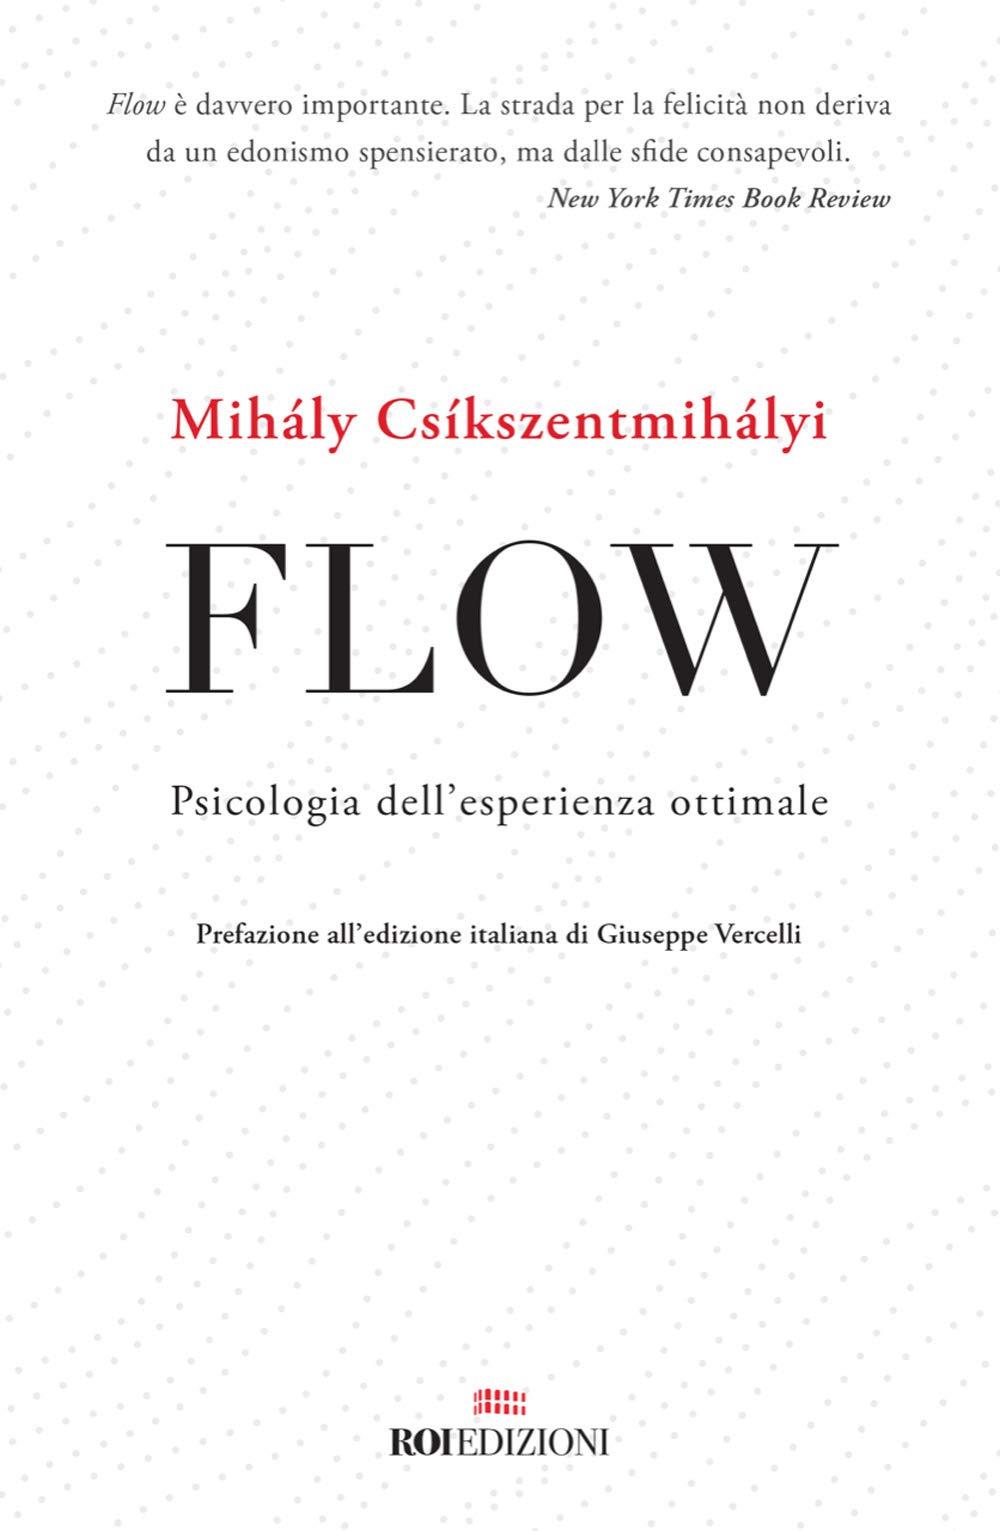 Copertina Libro Flow